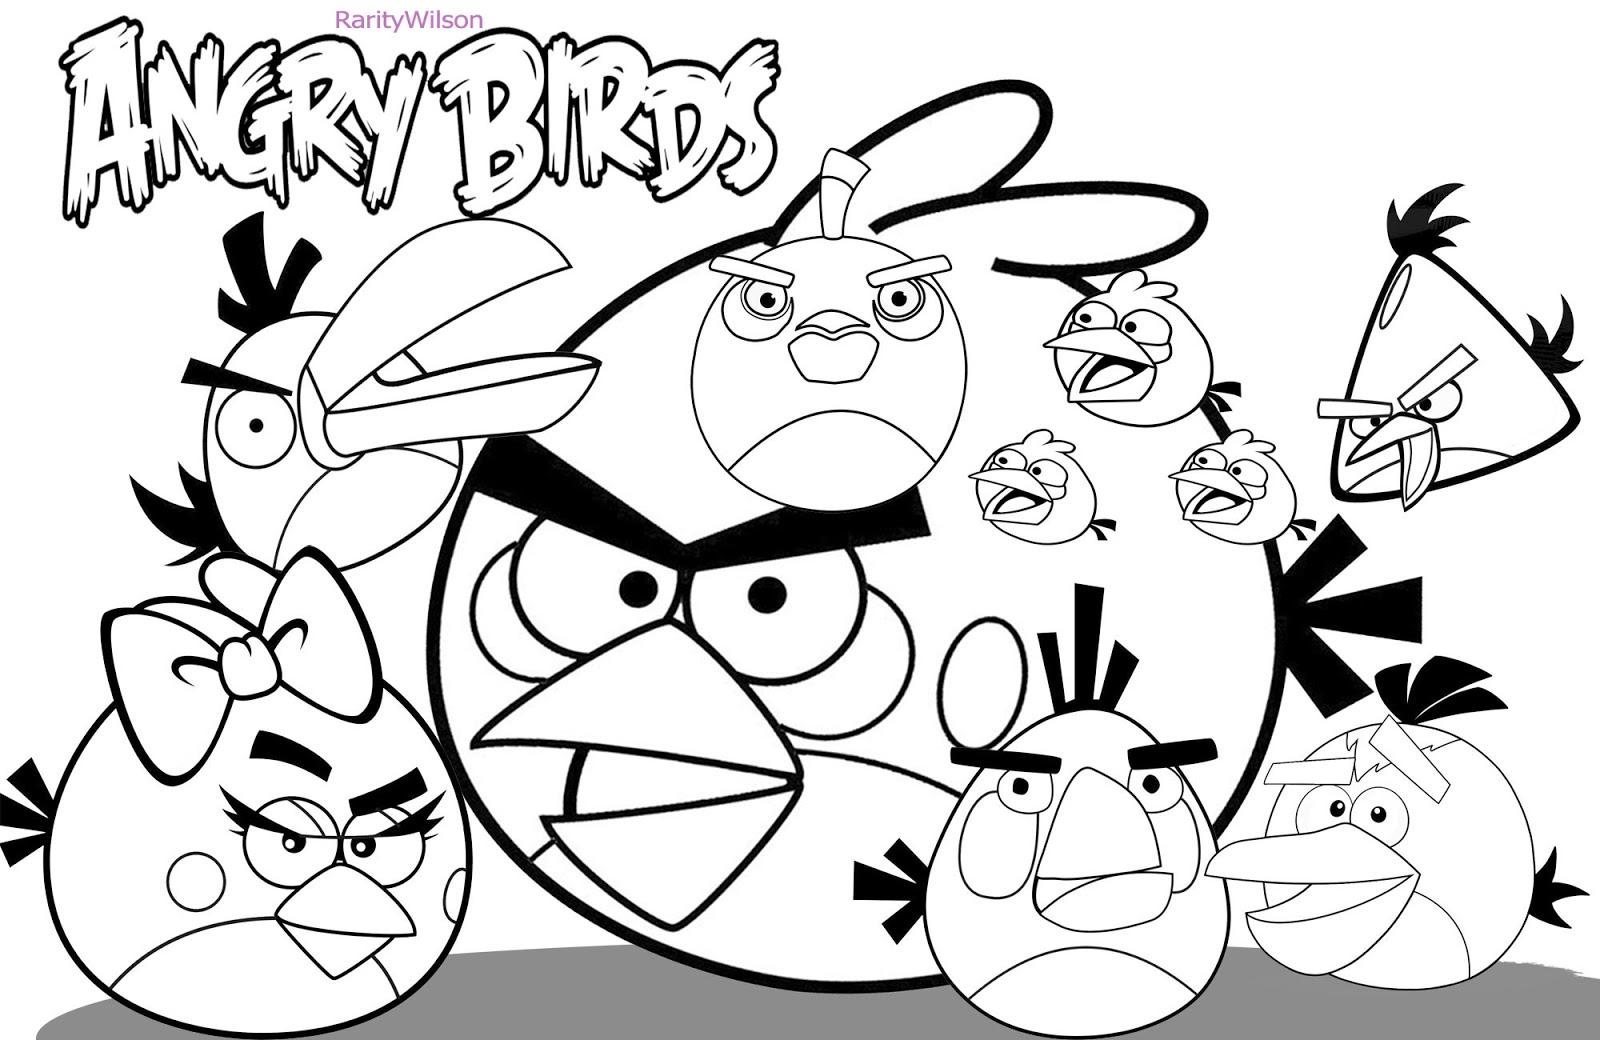 126 dibujos de Angry birds para colorear  Oh Kids  Page 1